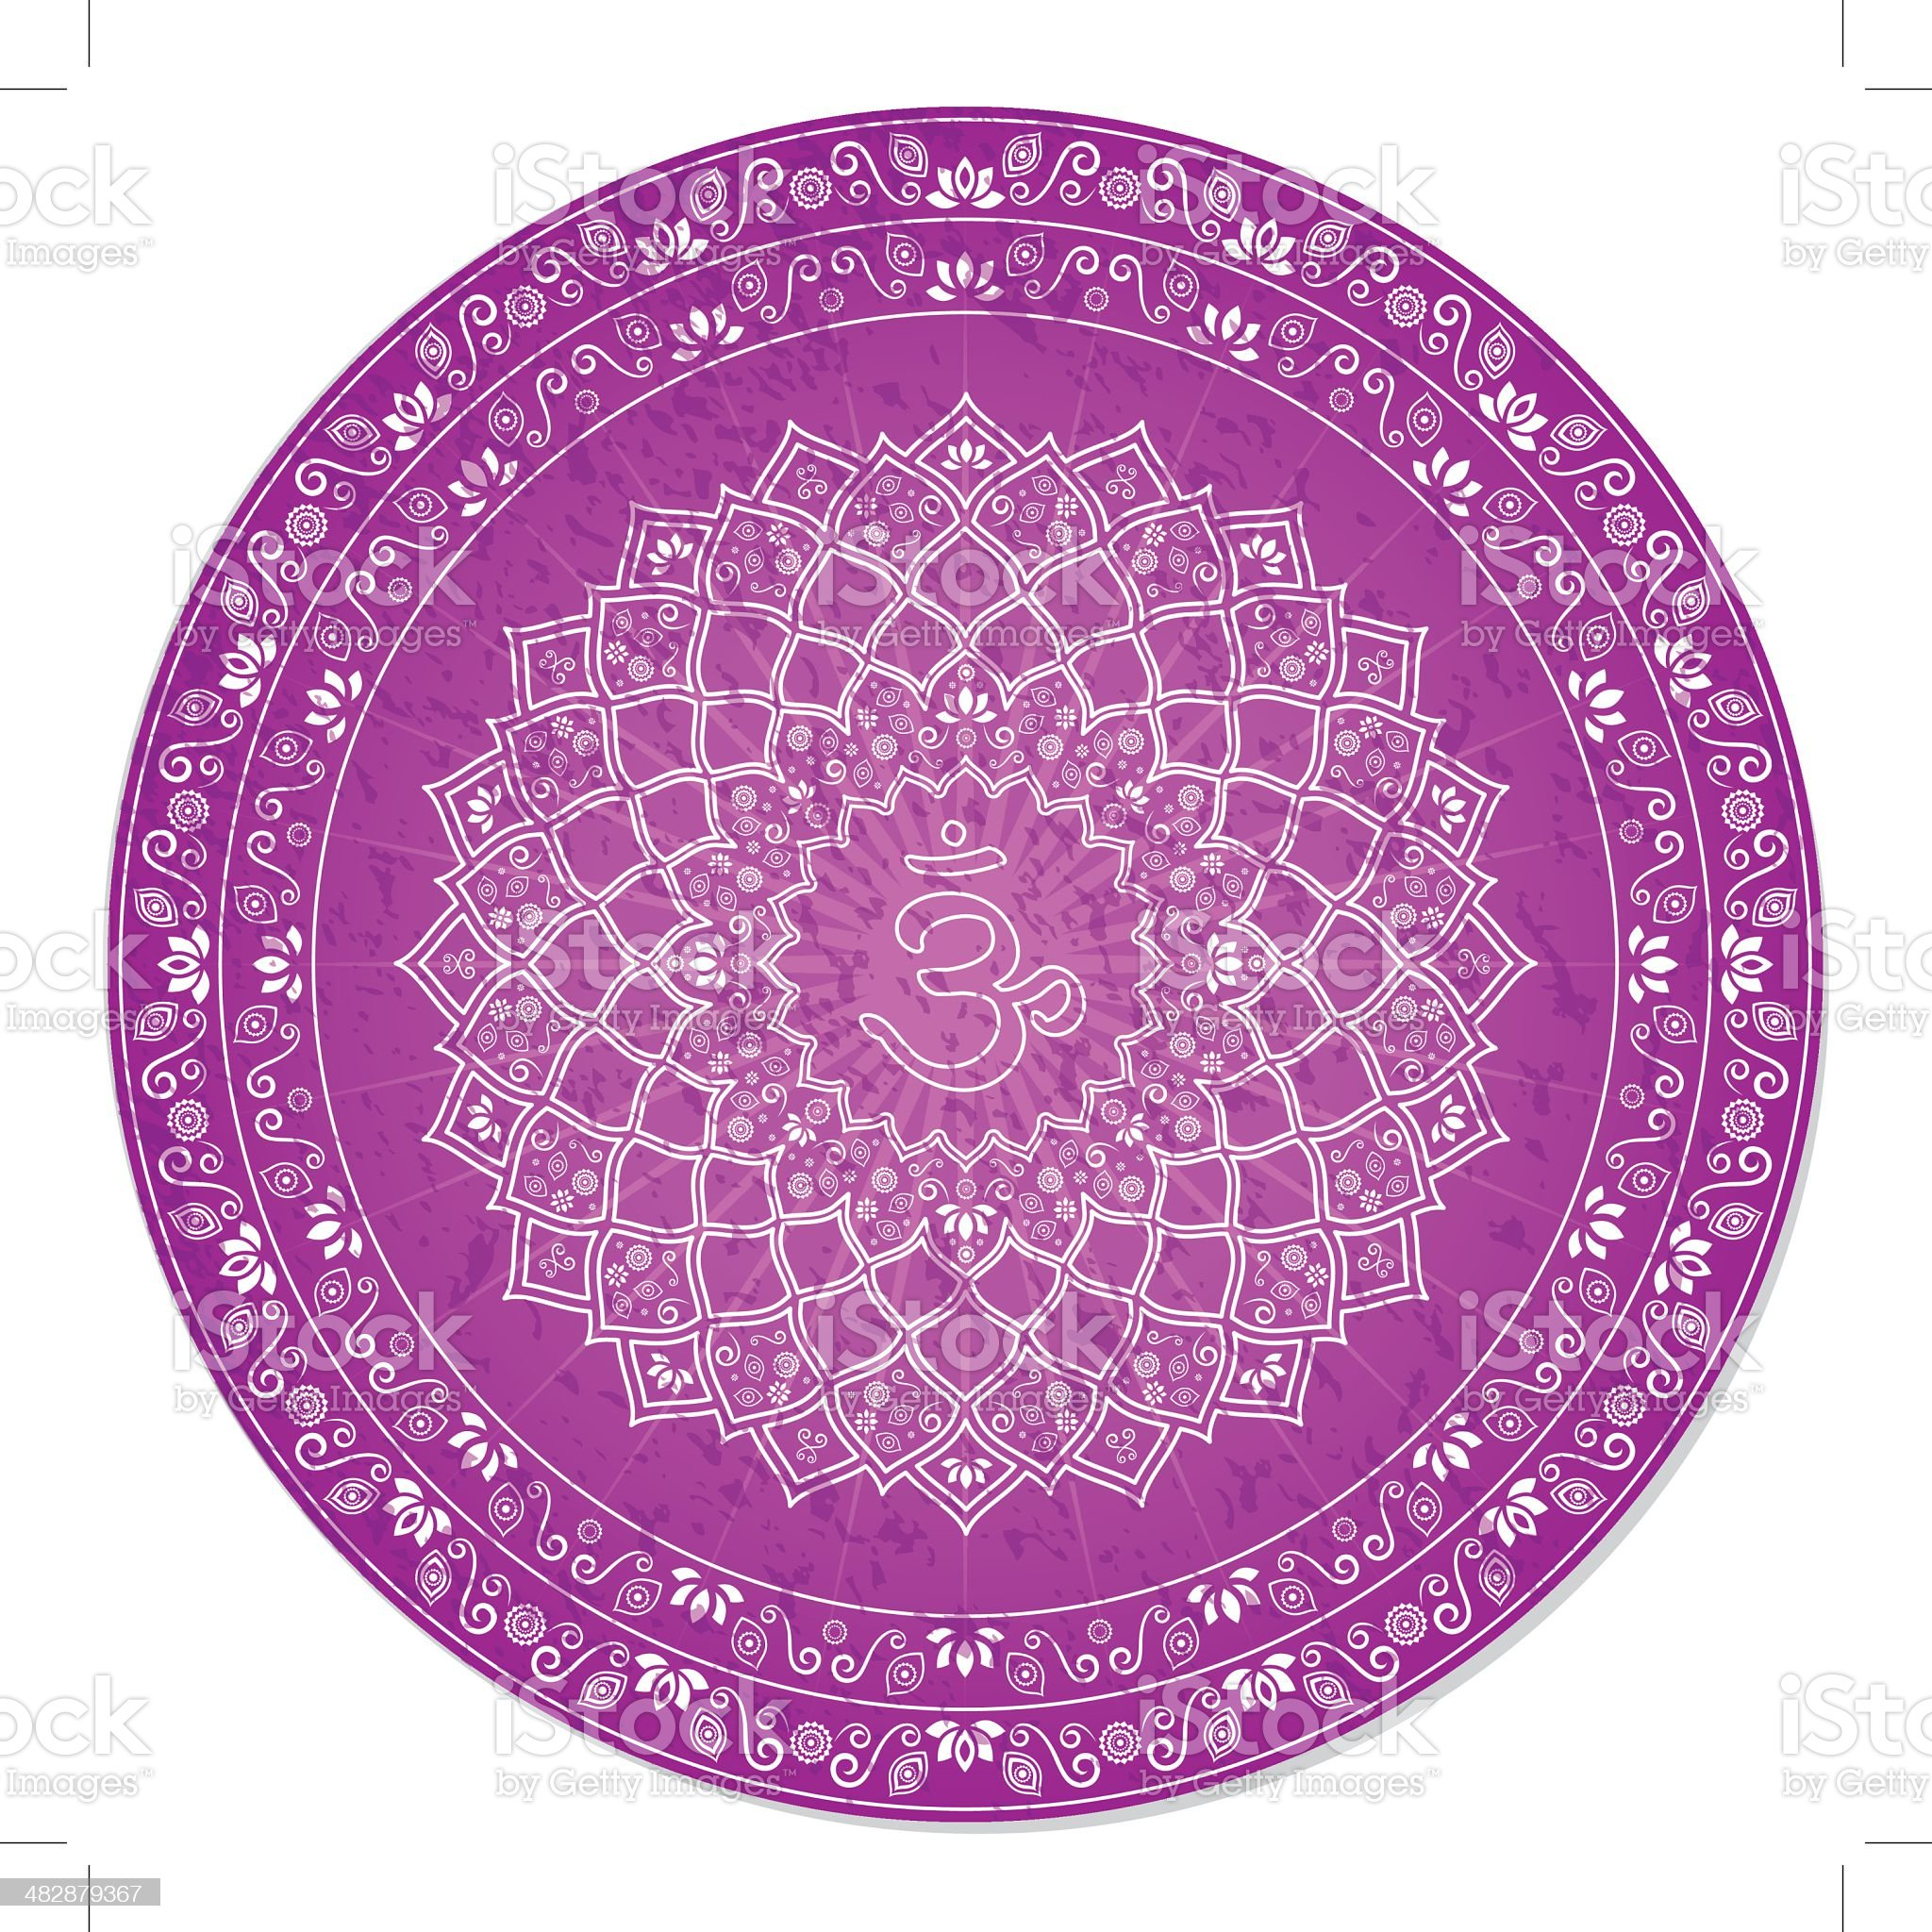 Seventh Chakra Decorative royalty-free stock vector art